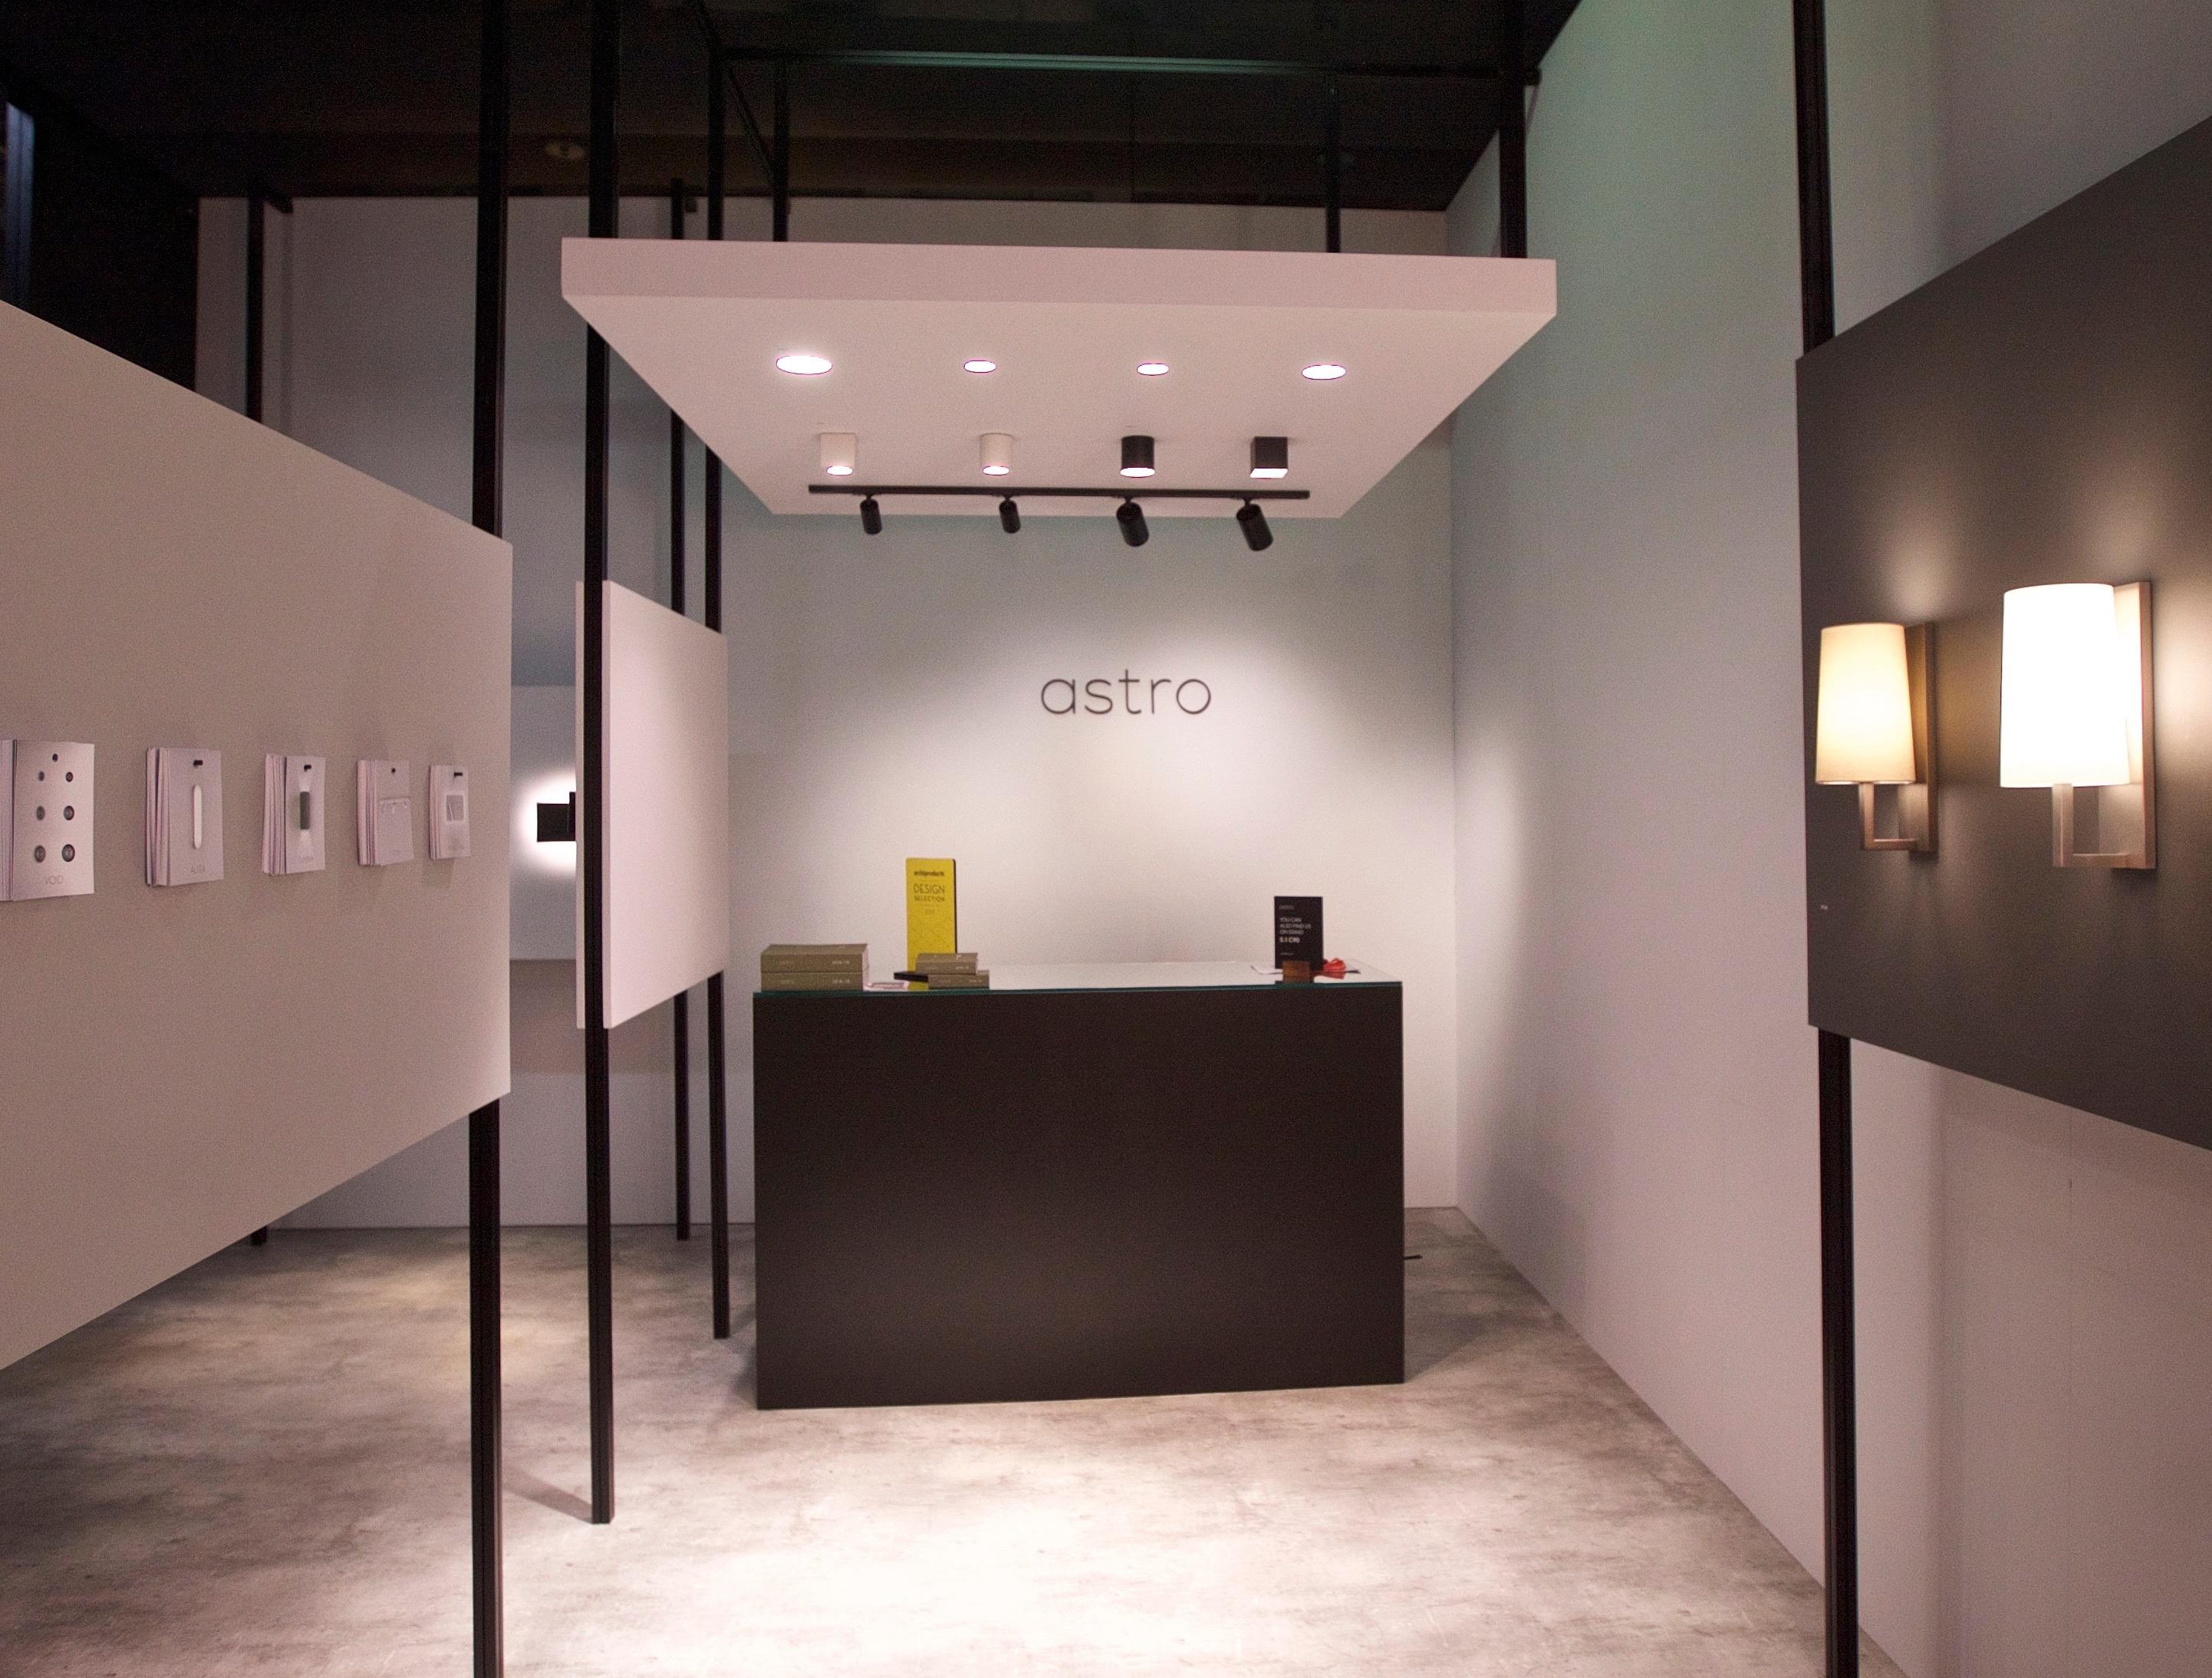 co lighting of smsender decorative lamps plus outdoor hanging indoor string lights light tulum best interior